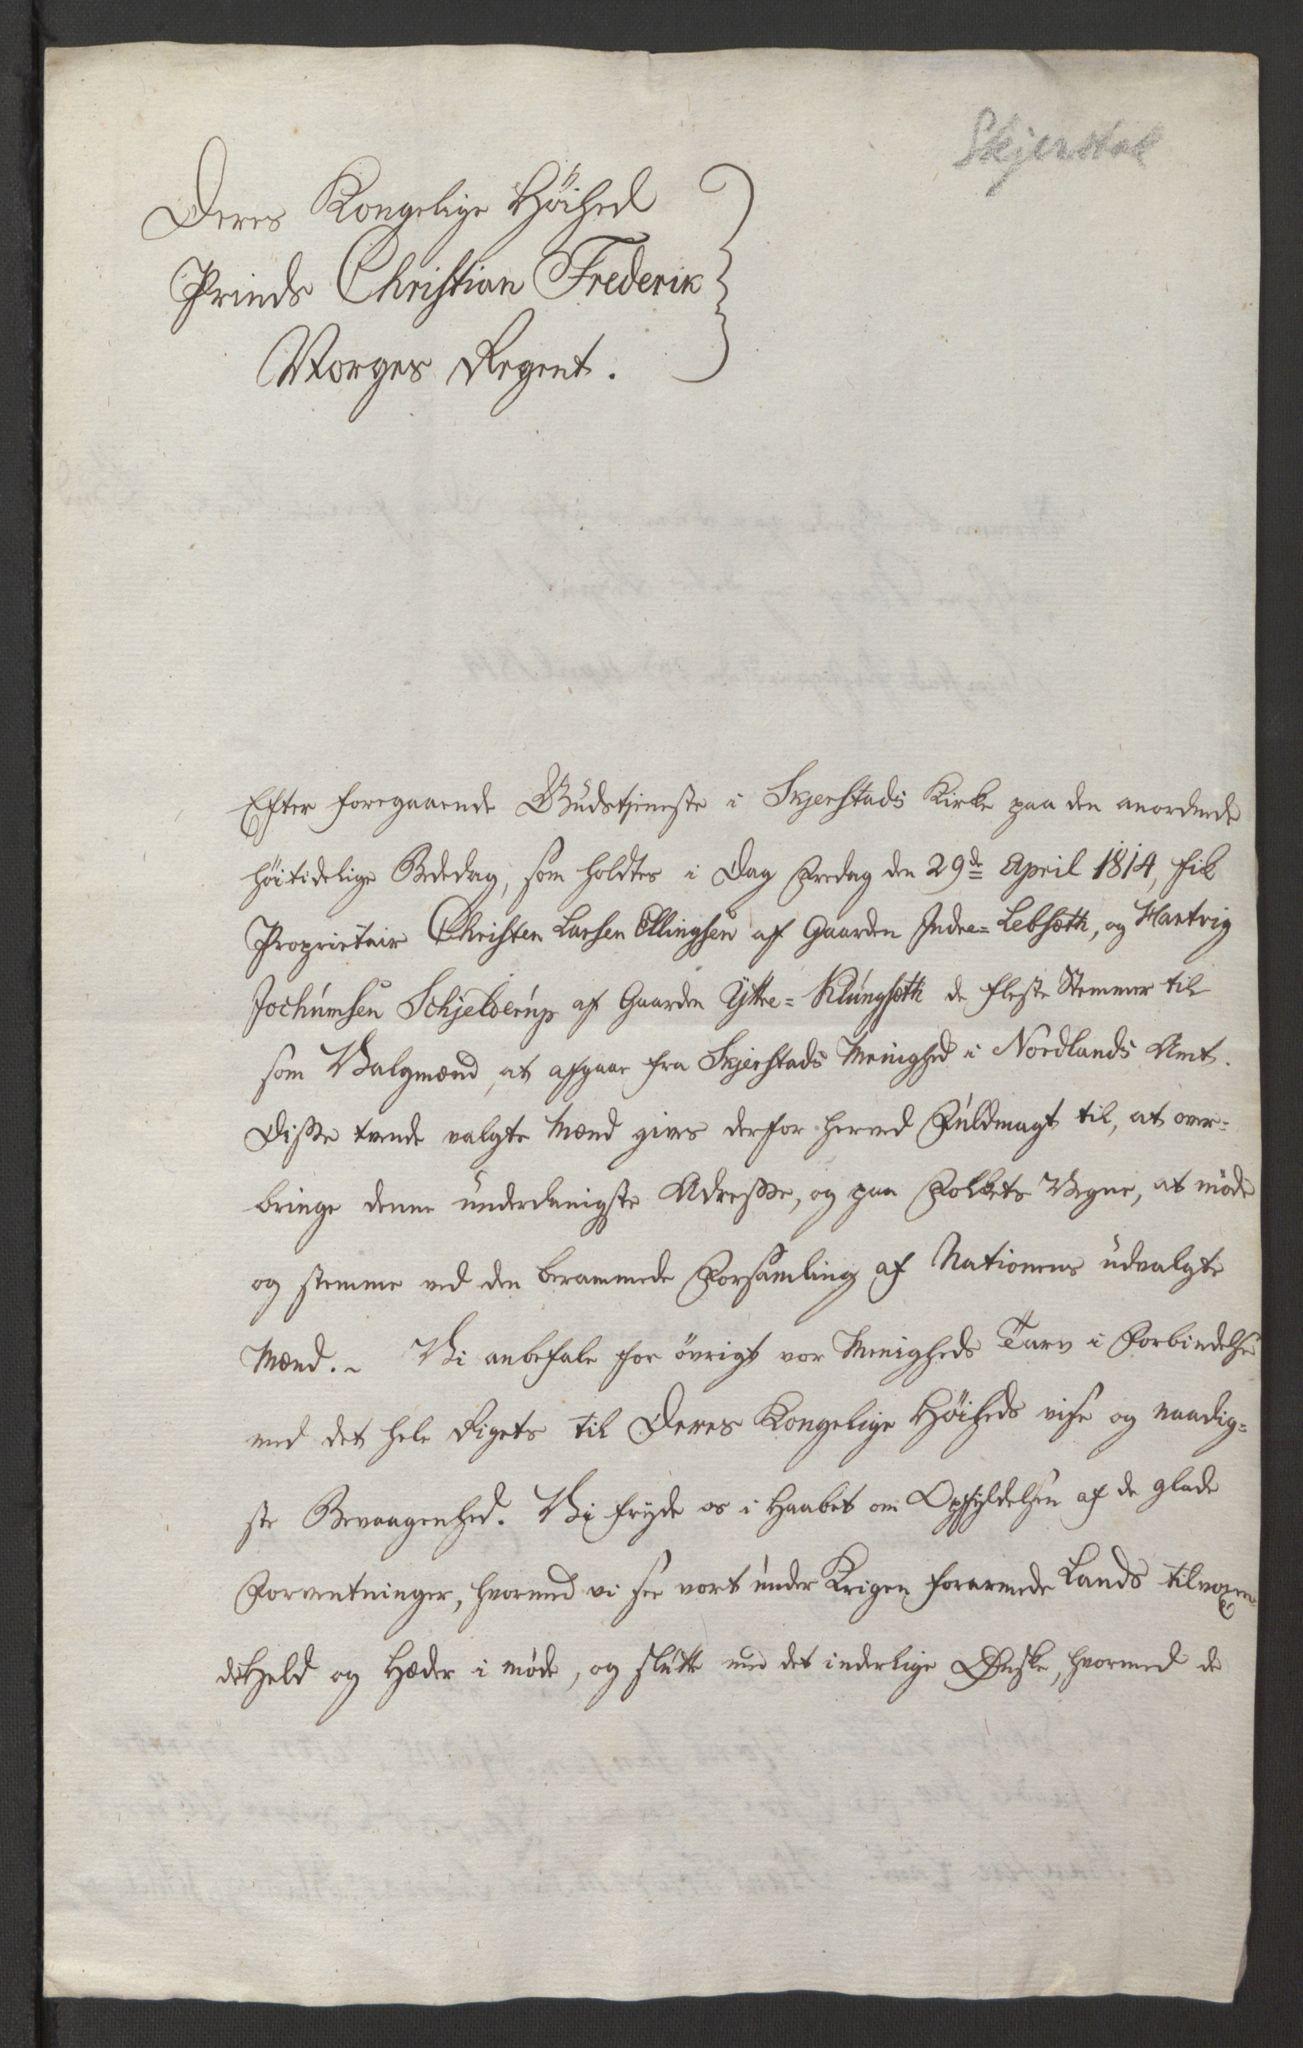 SAT, Nordland amt/fylke*, 1814, s. 42